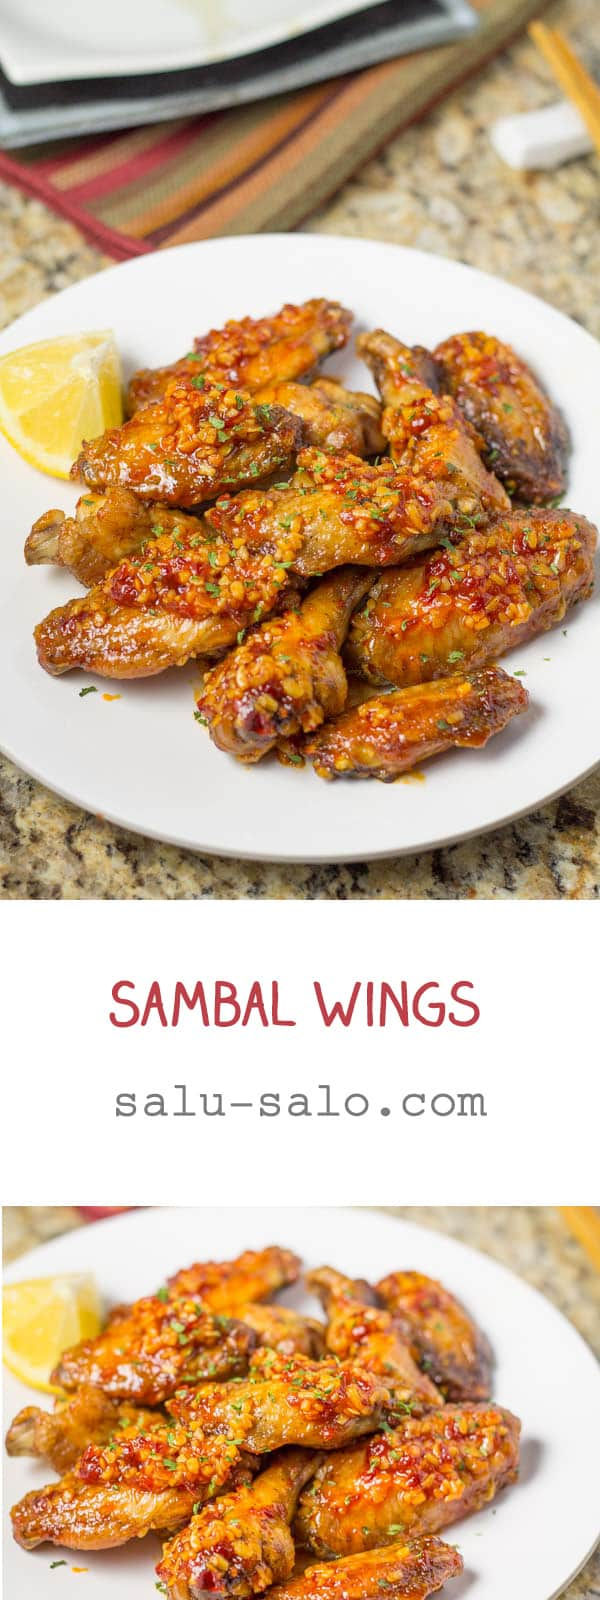 Sambal Wings